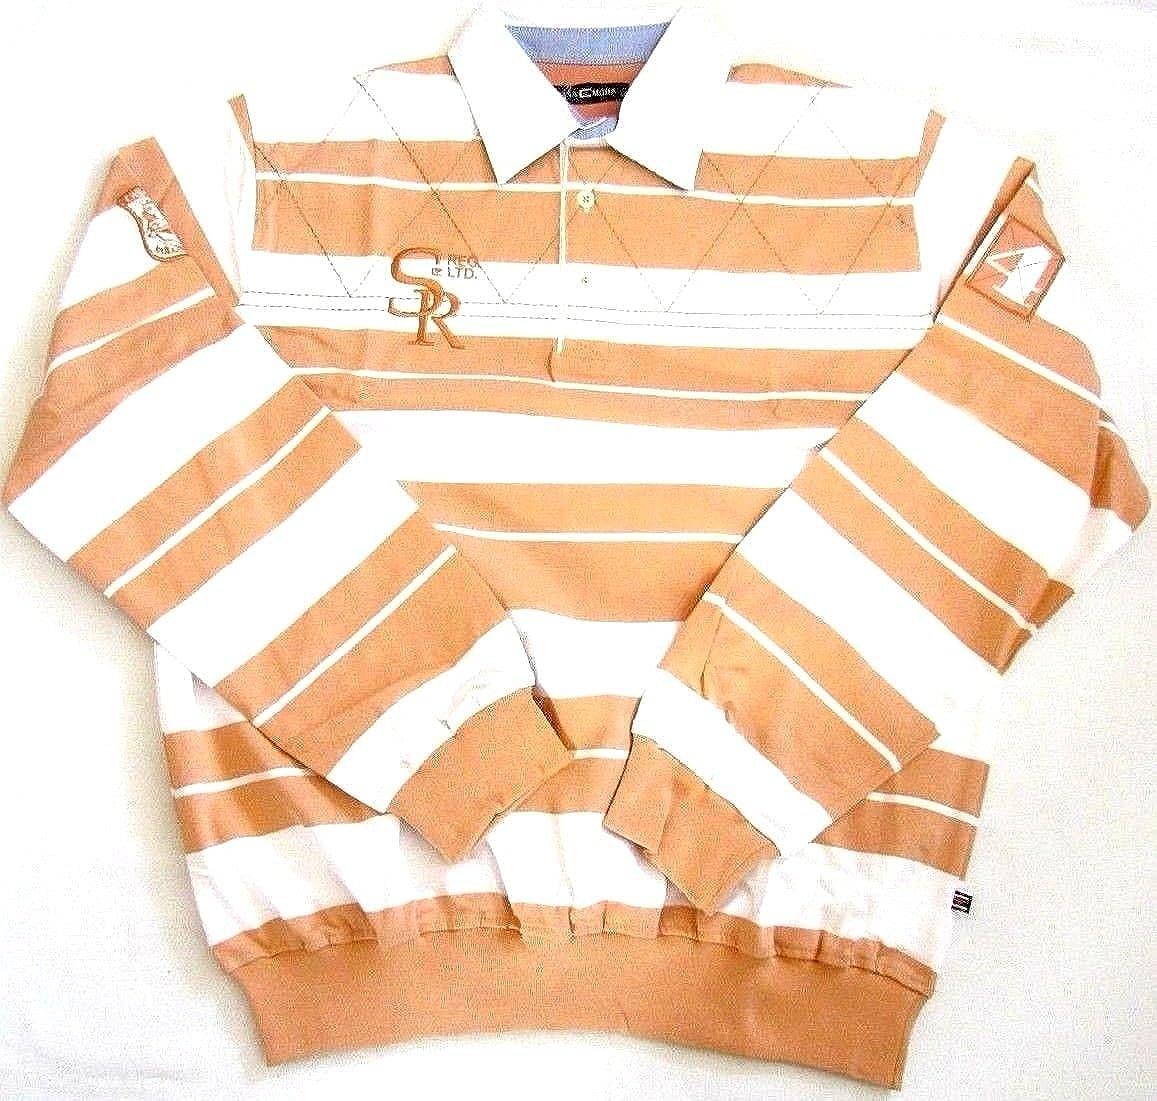 CASA MODA Herren Poloshirt longsleeve langarm Shirt mit Knopfleiste Orange M,L